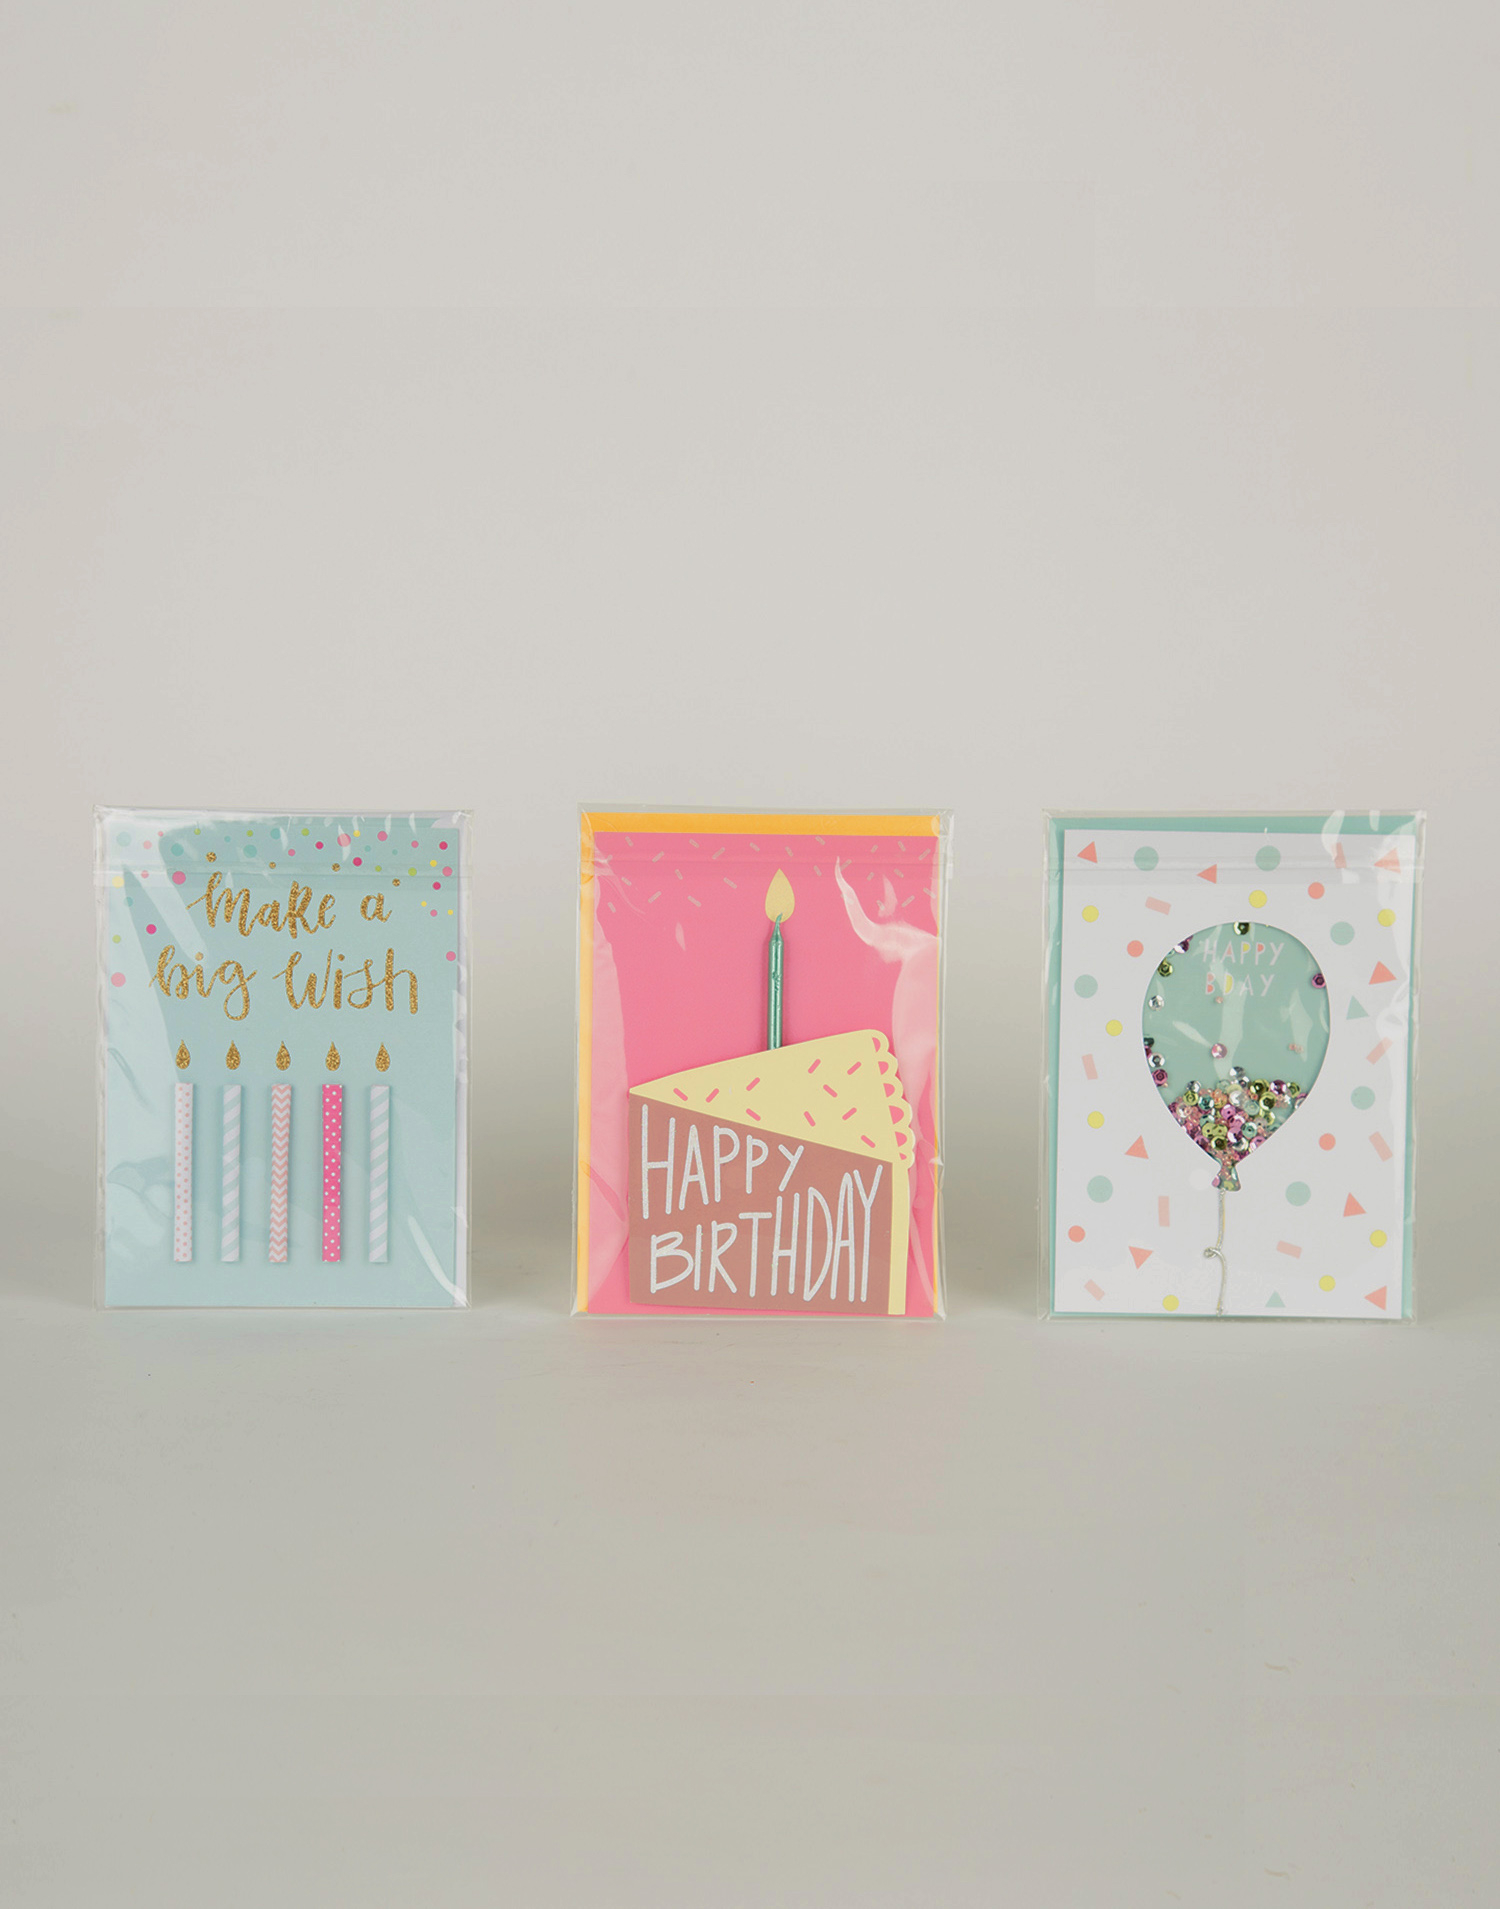 Geburtstagspostkarte